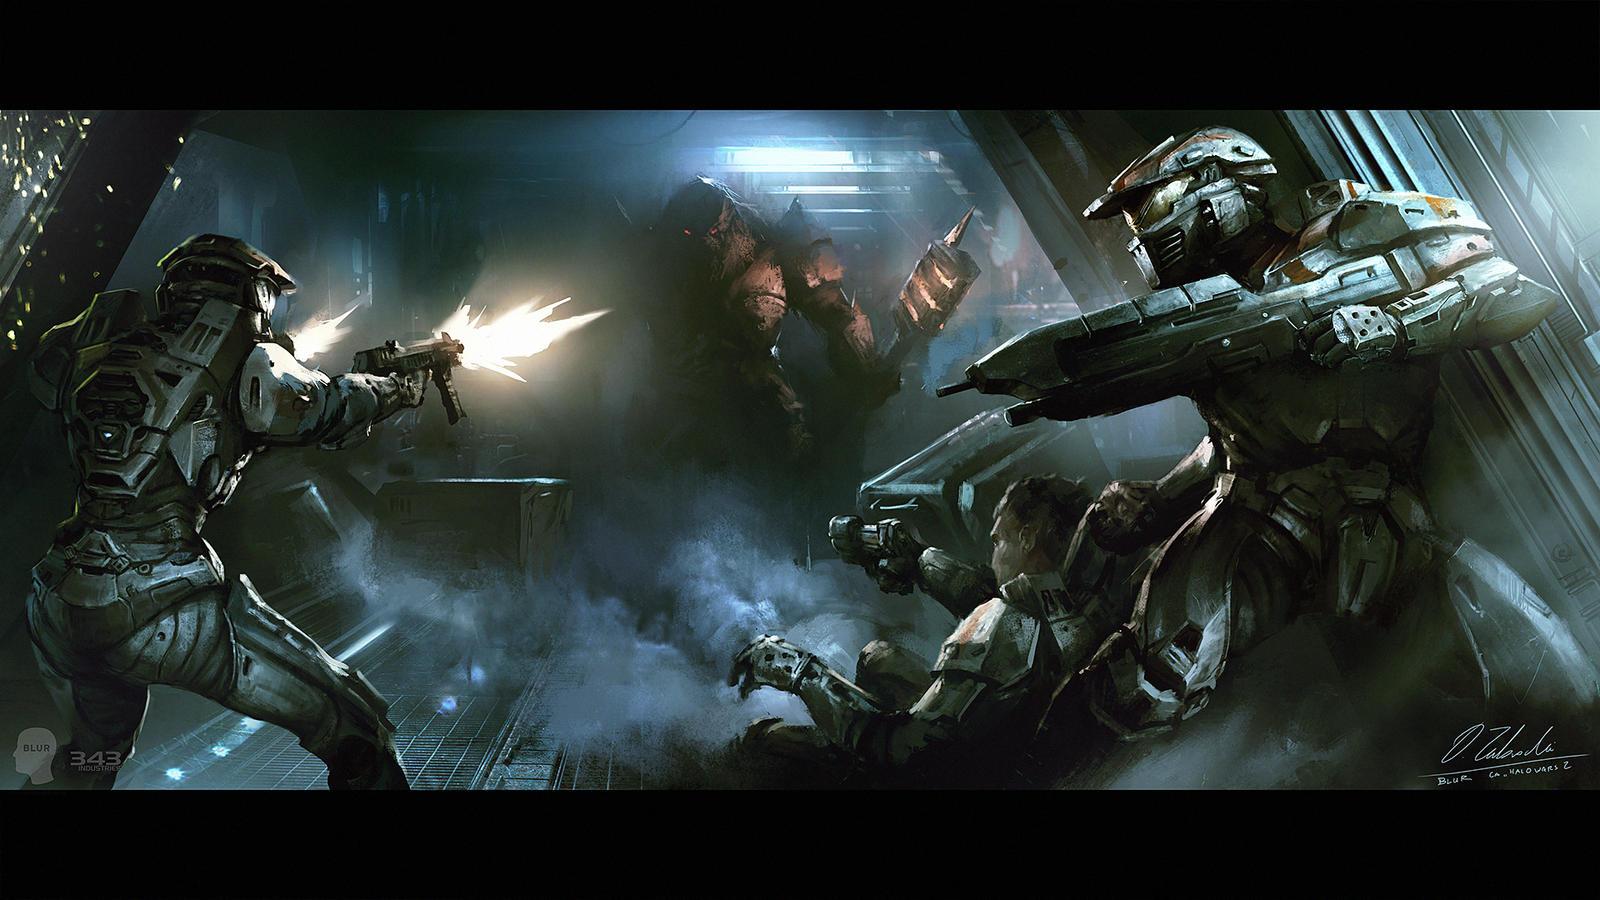 halo wars battles wallpaper - photo #26